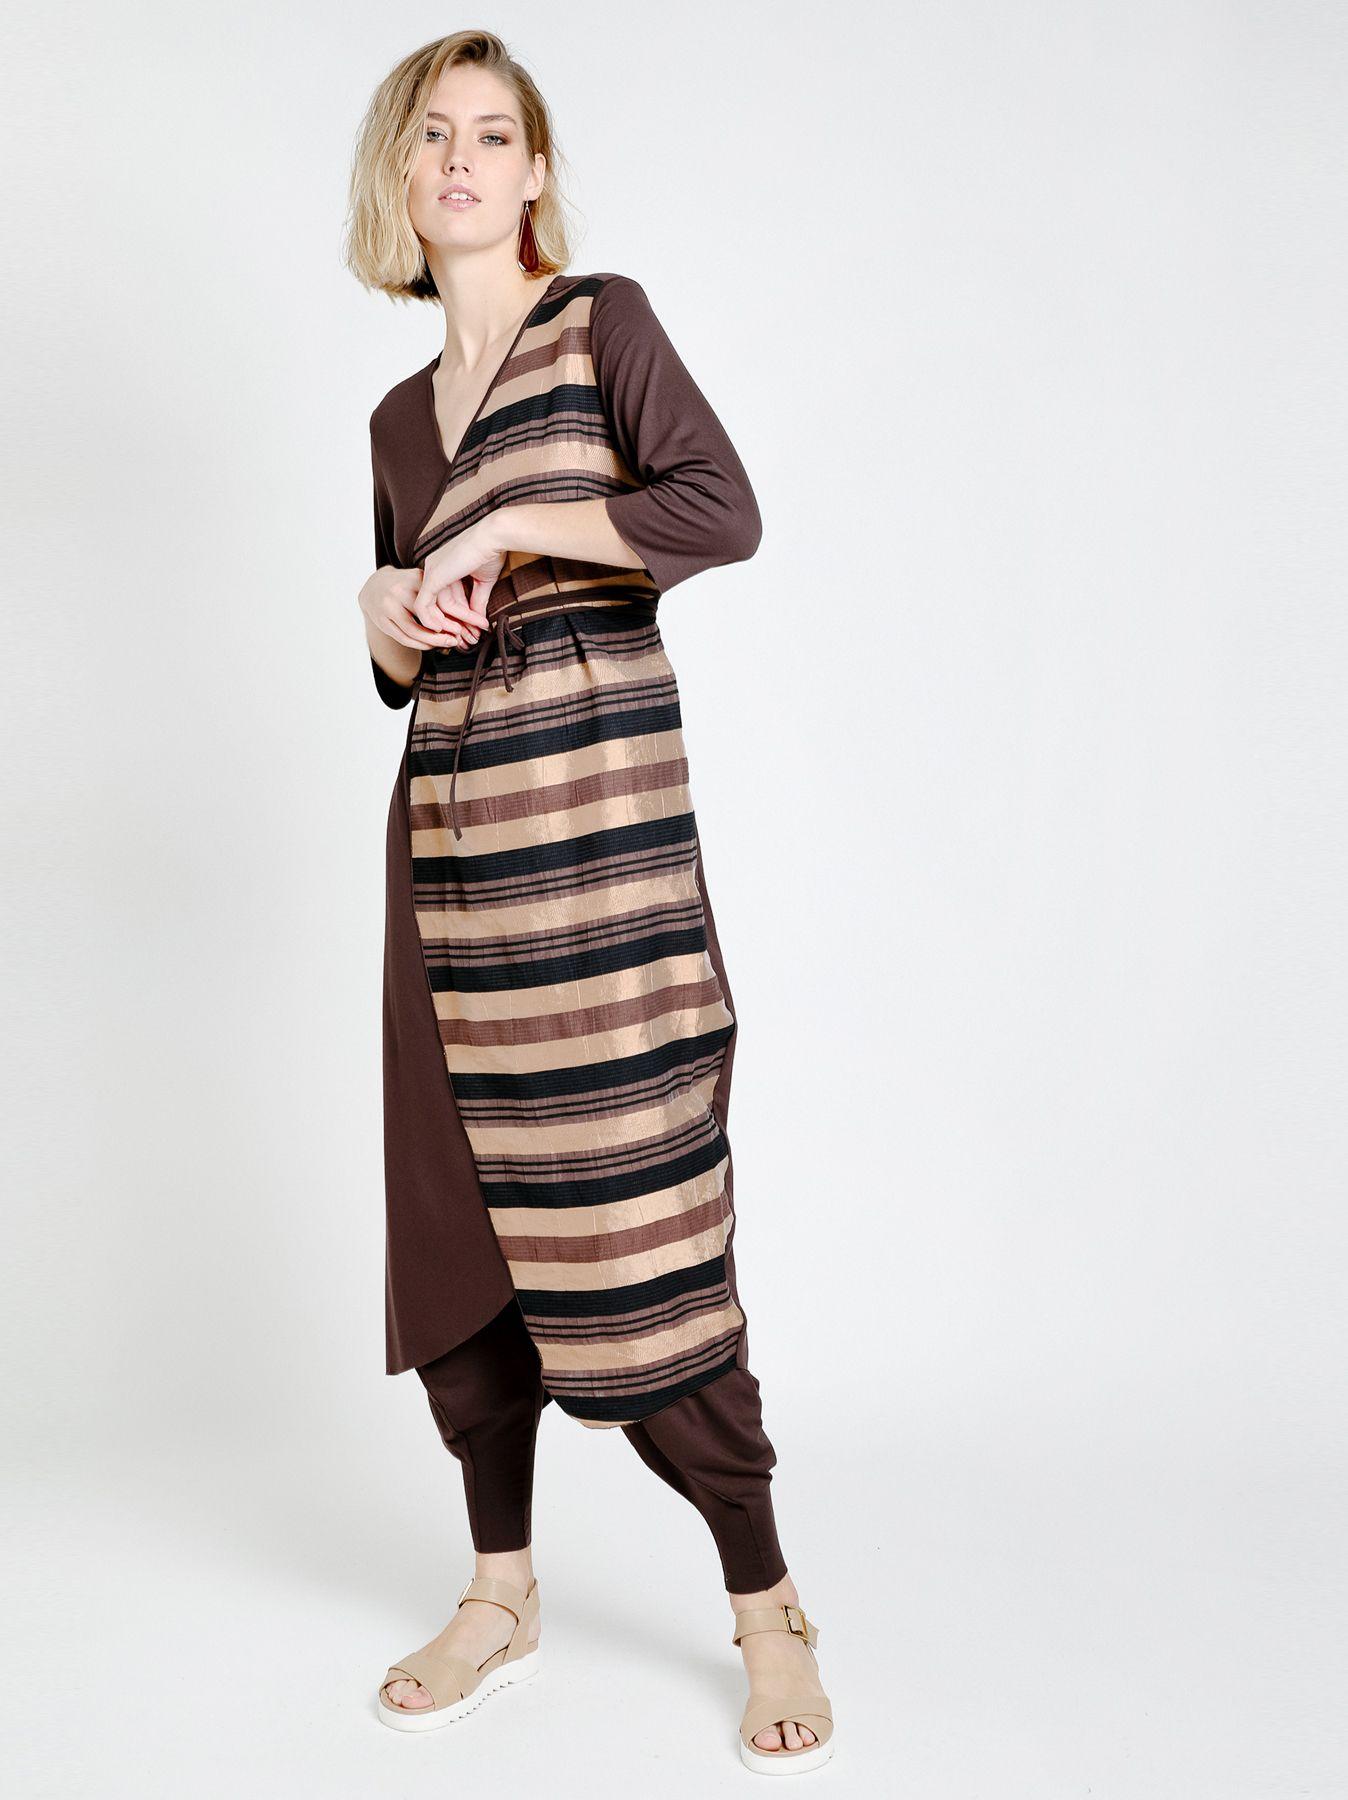 Panel dress